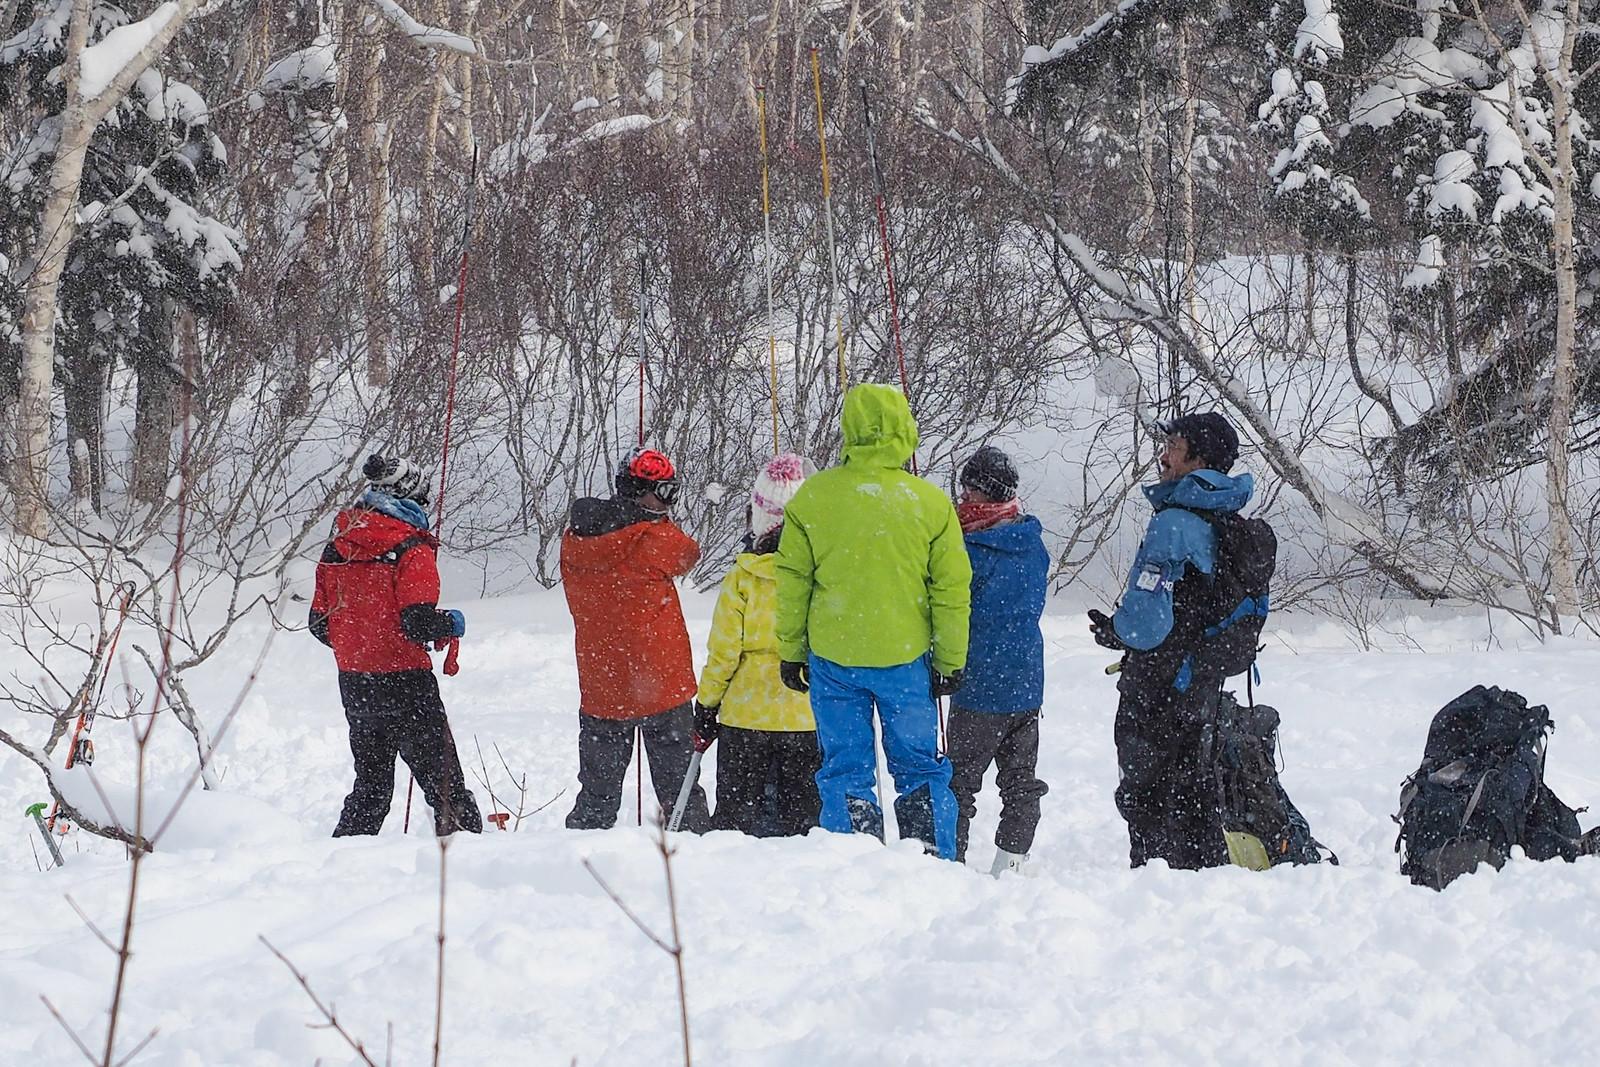 Paddle Club Sapporo Avalanche Course (Teine Ski Area, Sapporo, Japan)